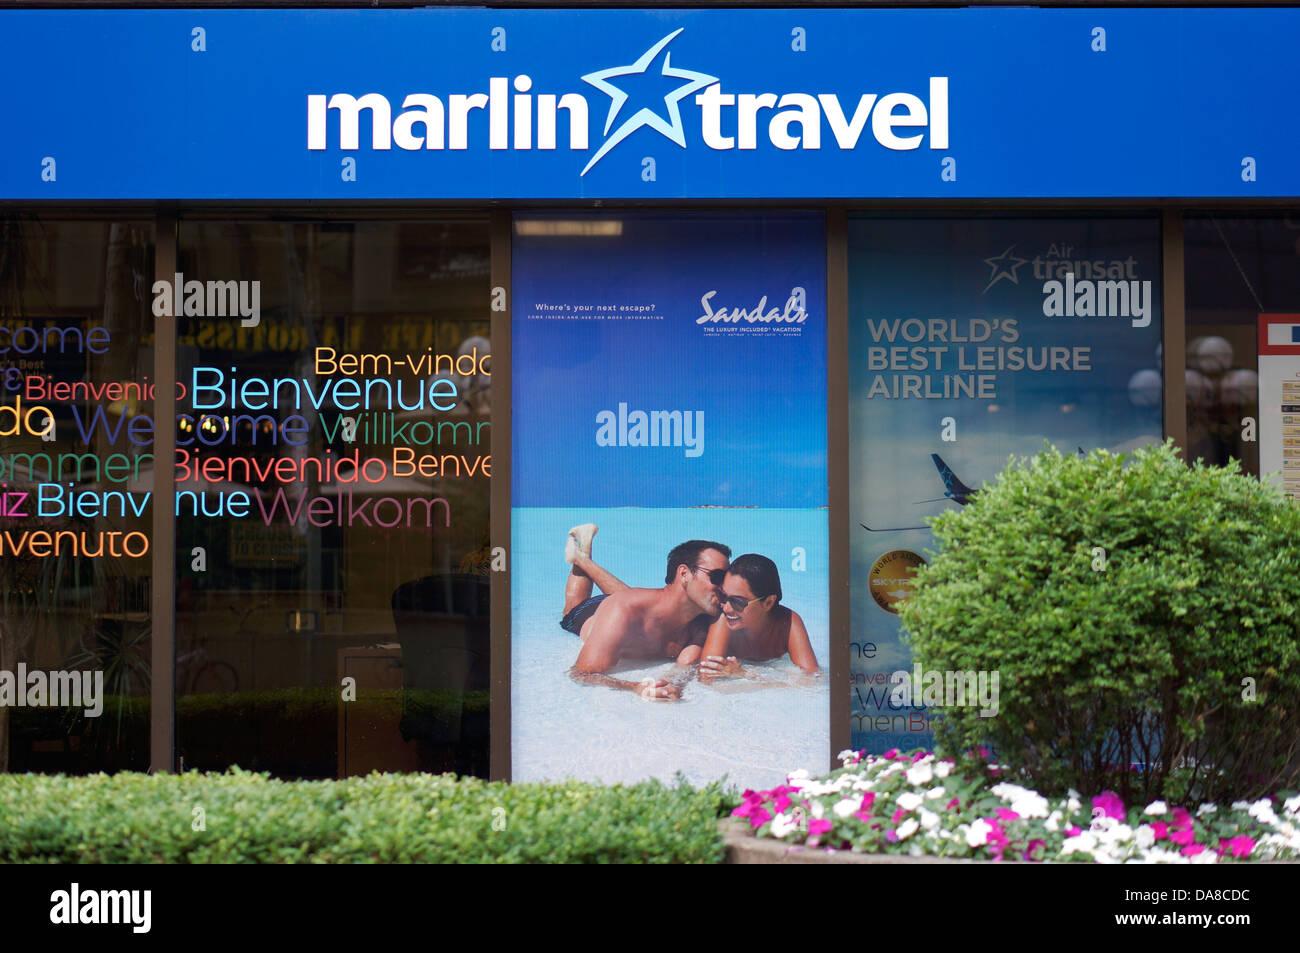 Marlin Travel, Travel Agent, Agency, Toronto - Stock Image